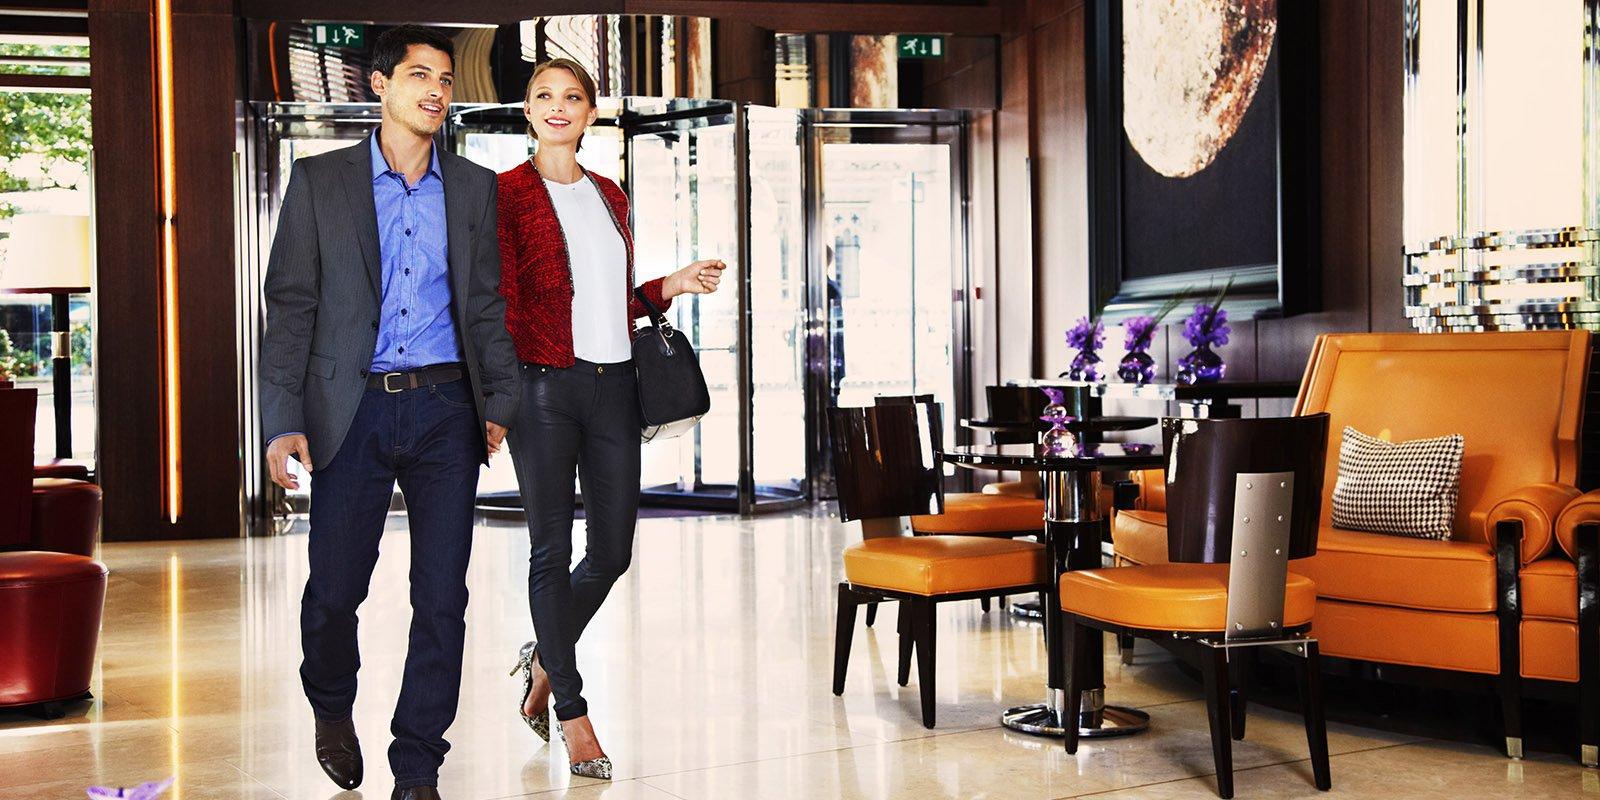 Hotel & Resort Lifestyle Shoots